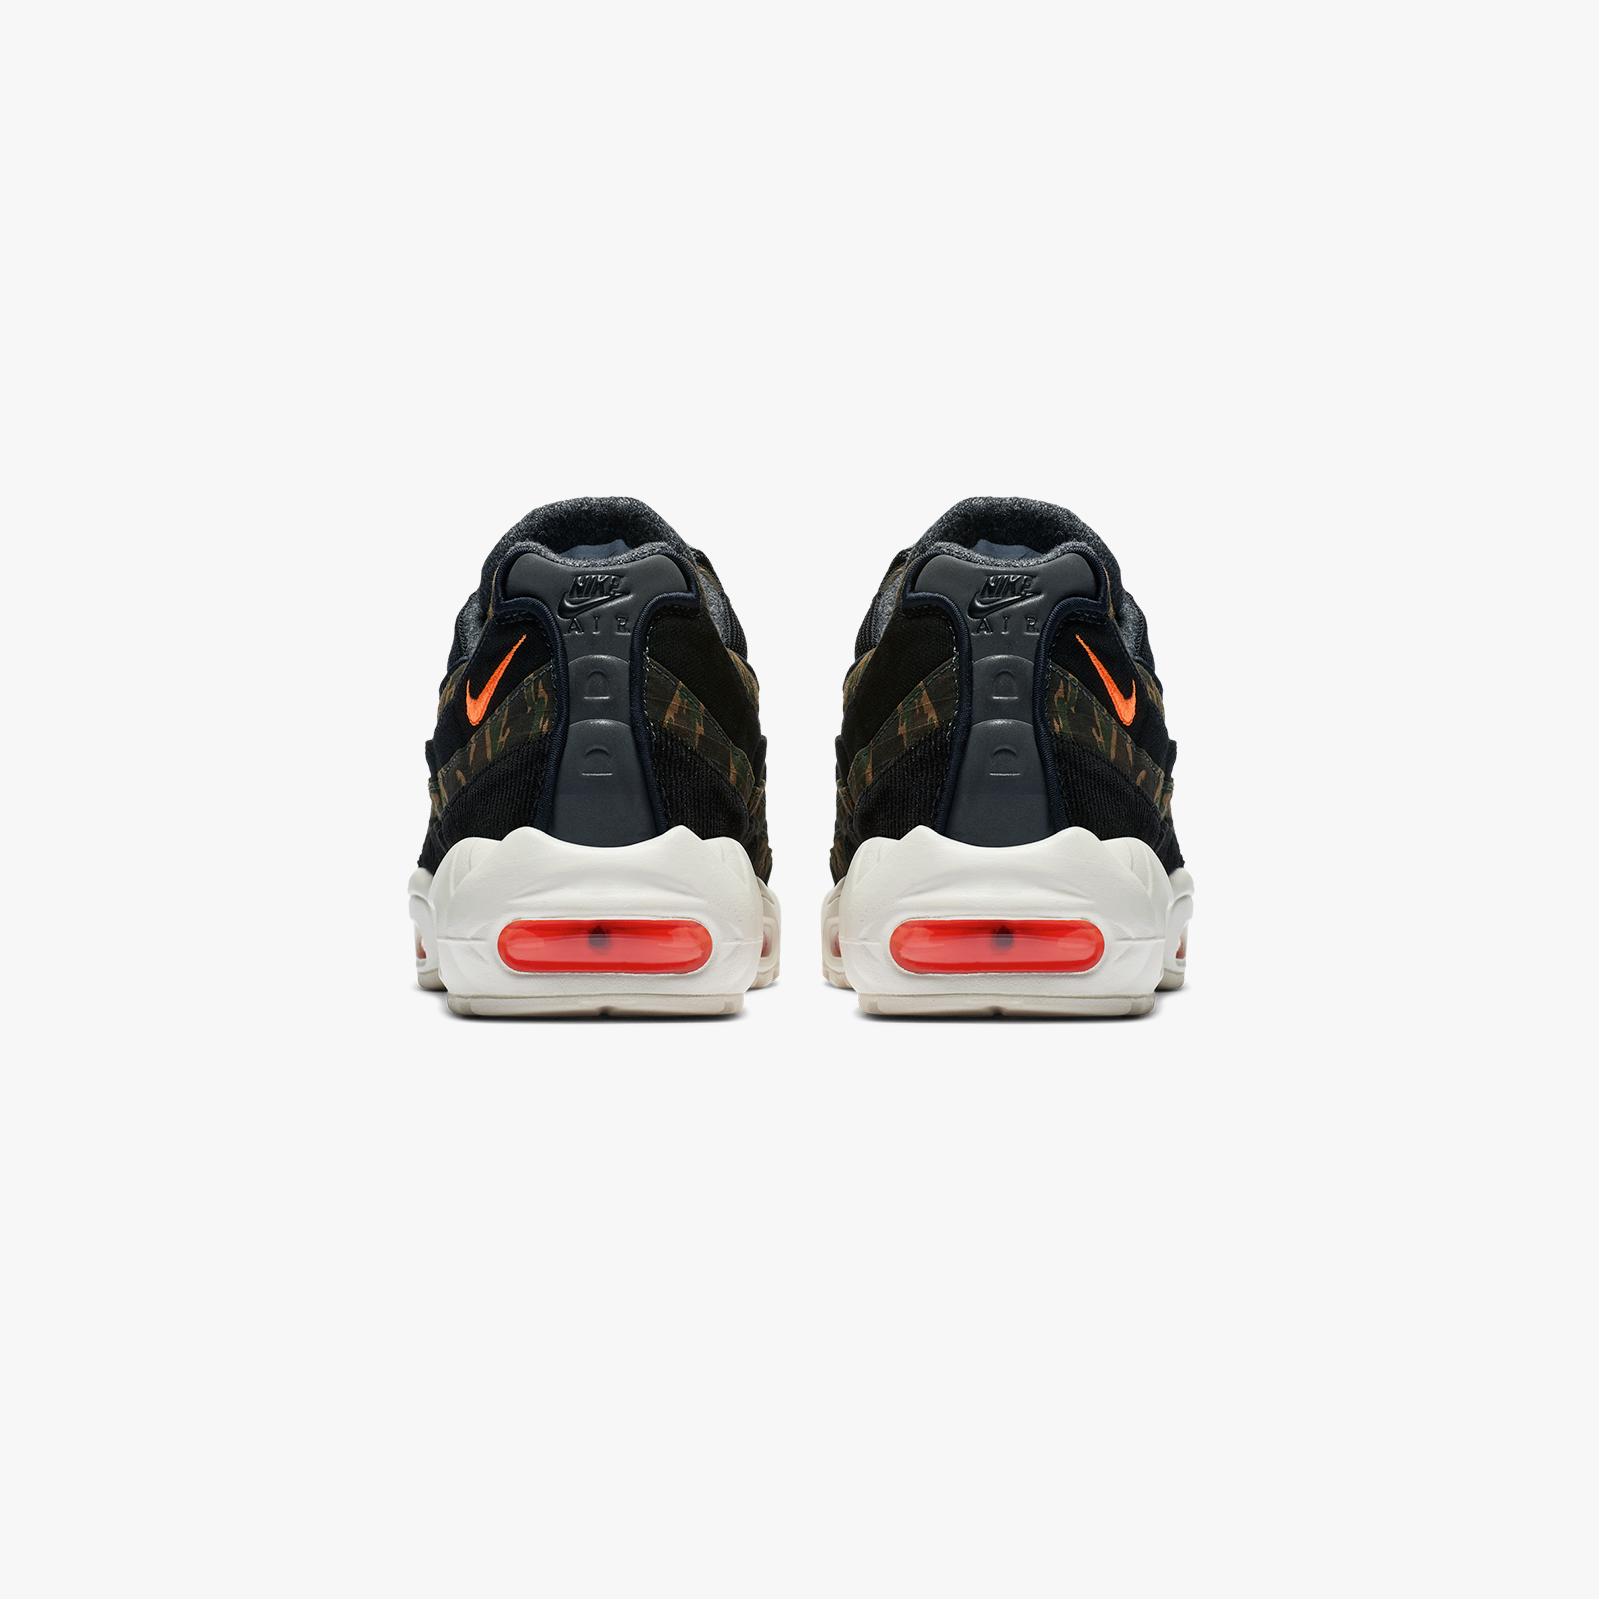 Nike Air Max 95 x Carhartt WIP - Av3866-001 - Sneakersnstuff ... 3632d651e